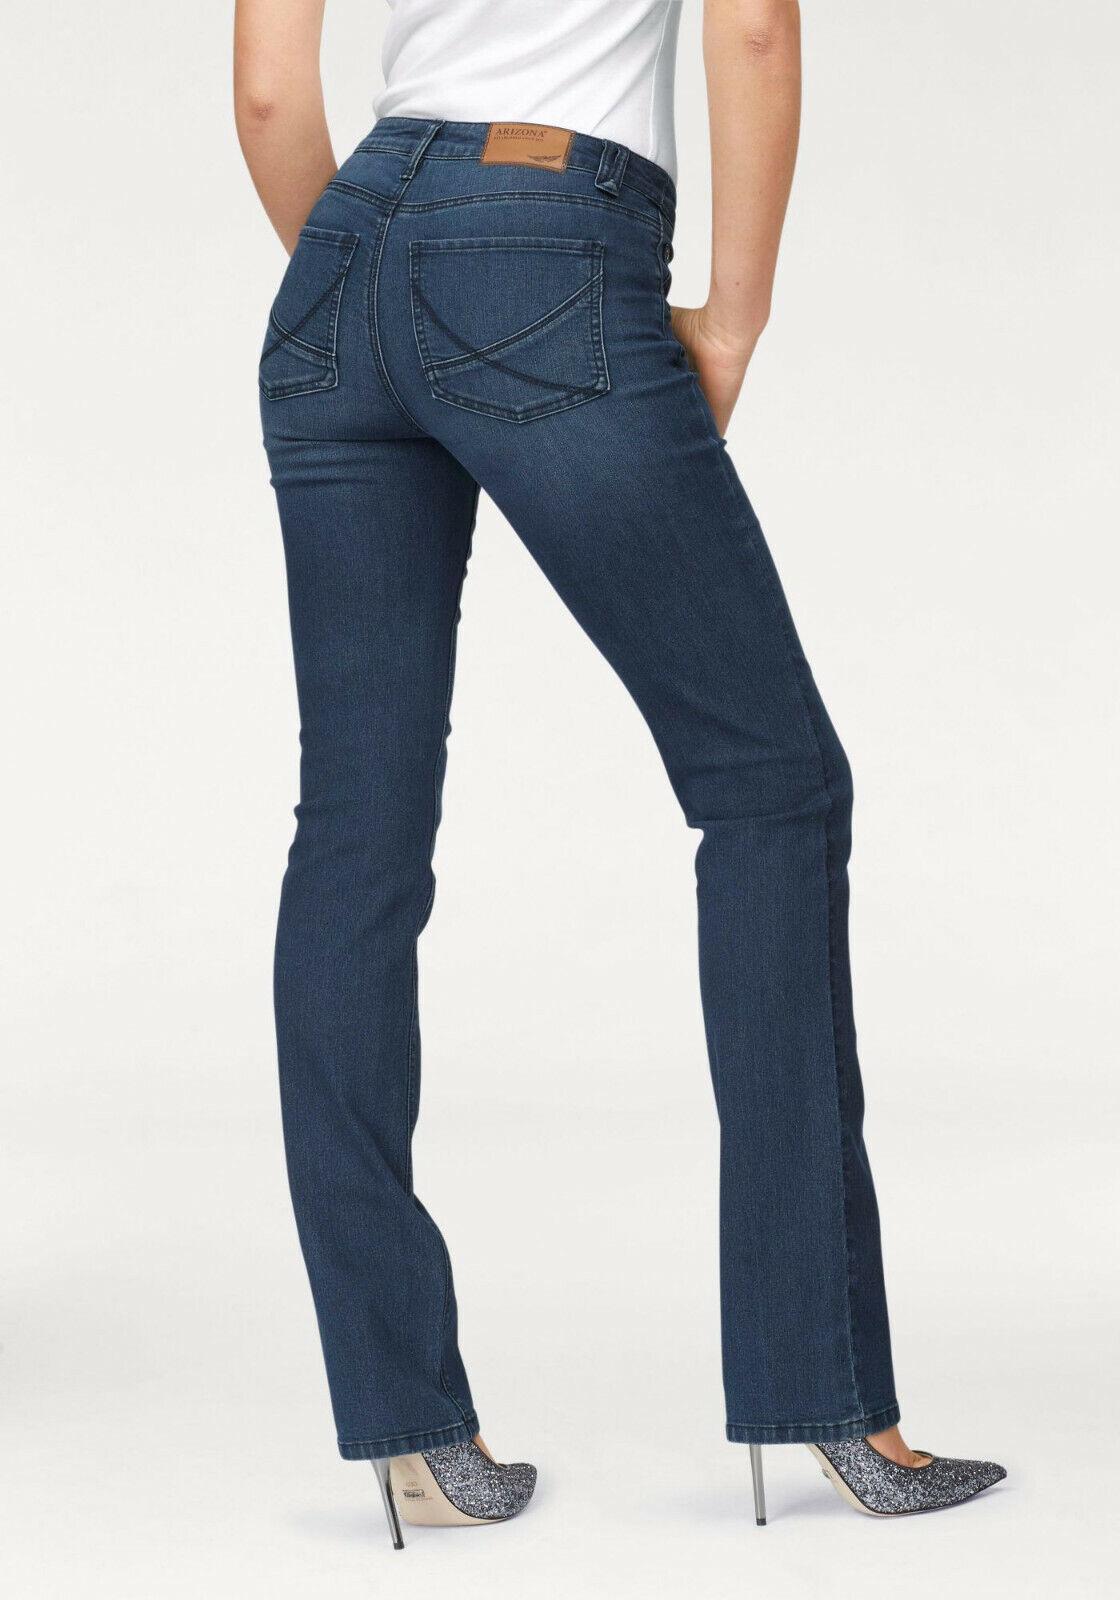 Details zu Arizona Gerade Jeans »Nathalie« blue used. Kurz Gr. NEU!!! KP 49,99 €